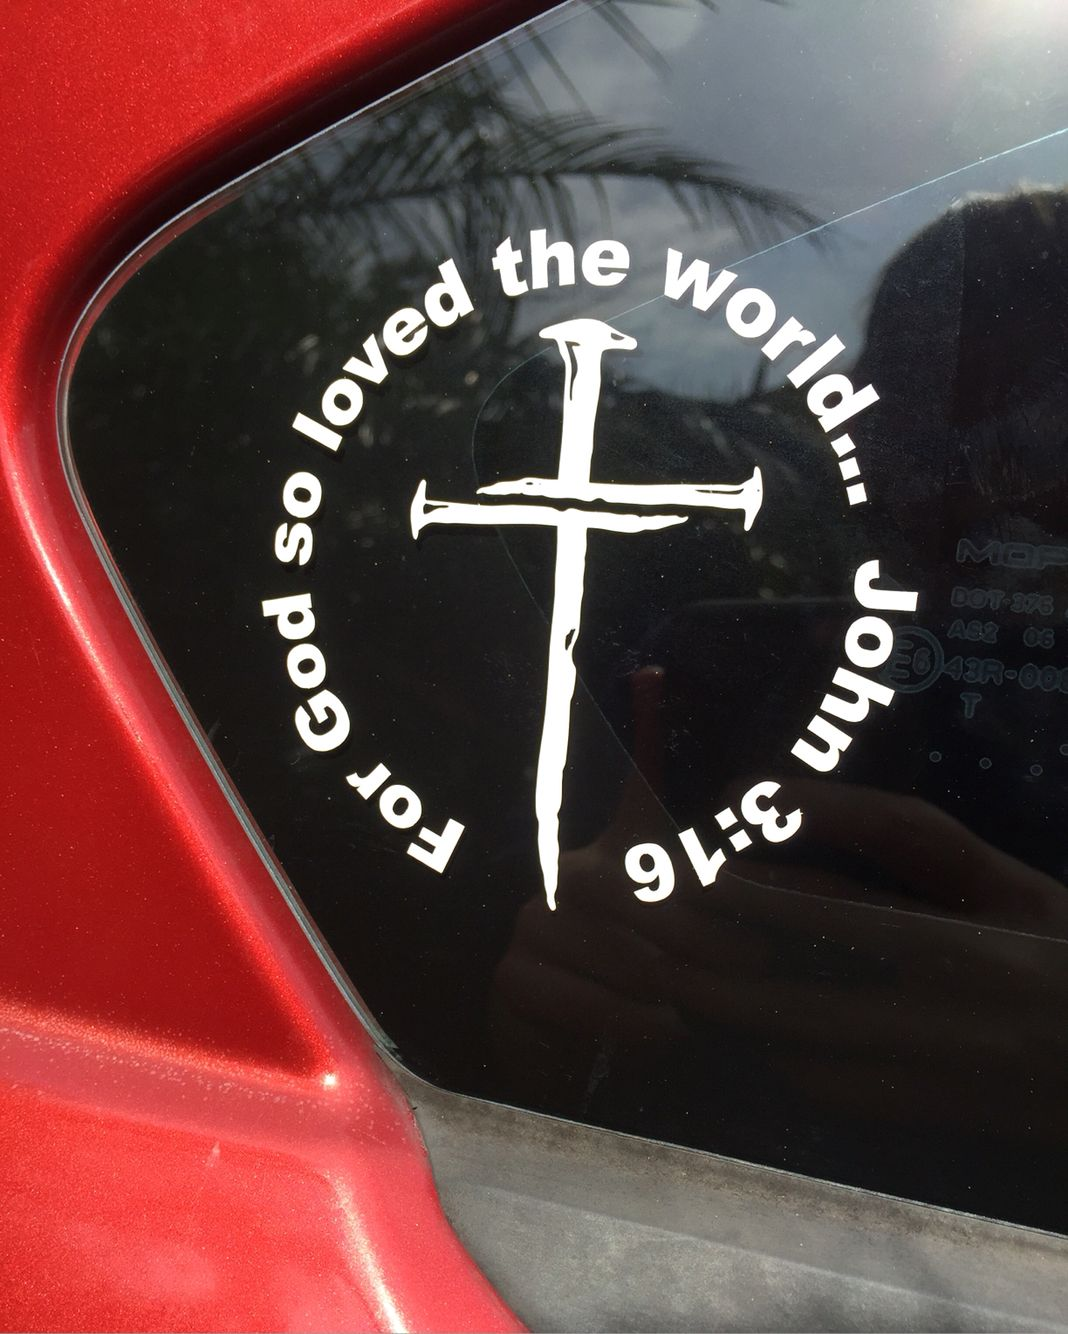 Vinyl Car Decal John 3 16 Nail Cross Car Sticker Design Christian Car Decals Car Decals Vinyl [ 1334 x 1068 Pixel ]